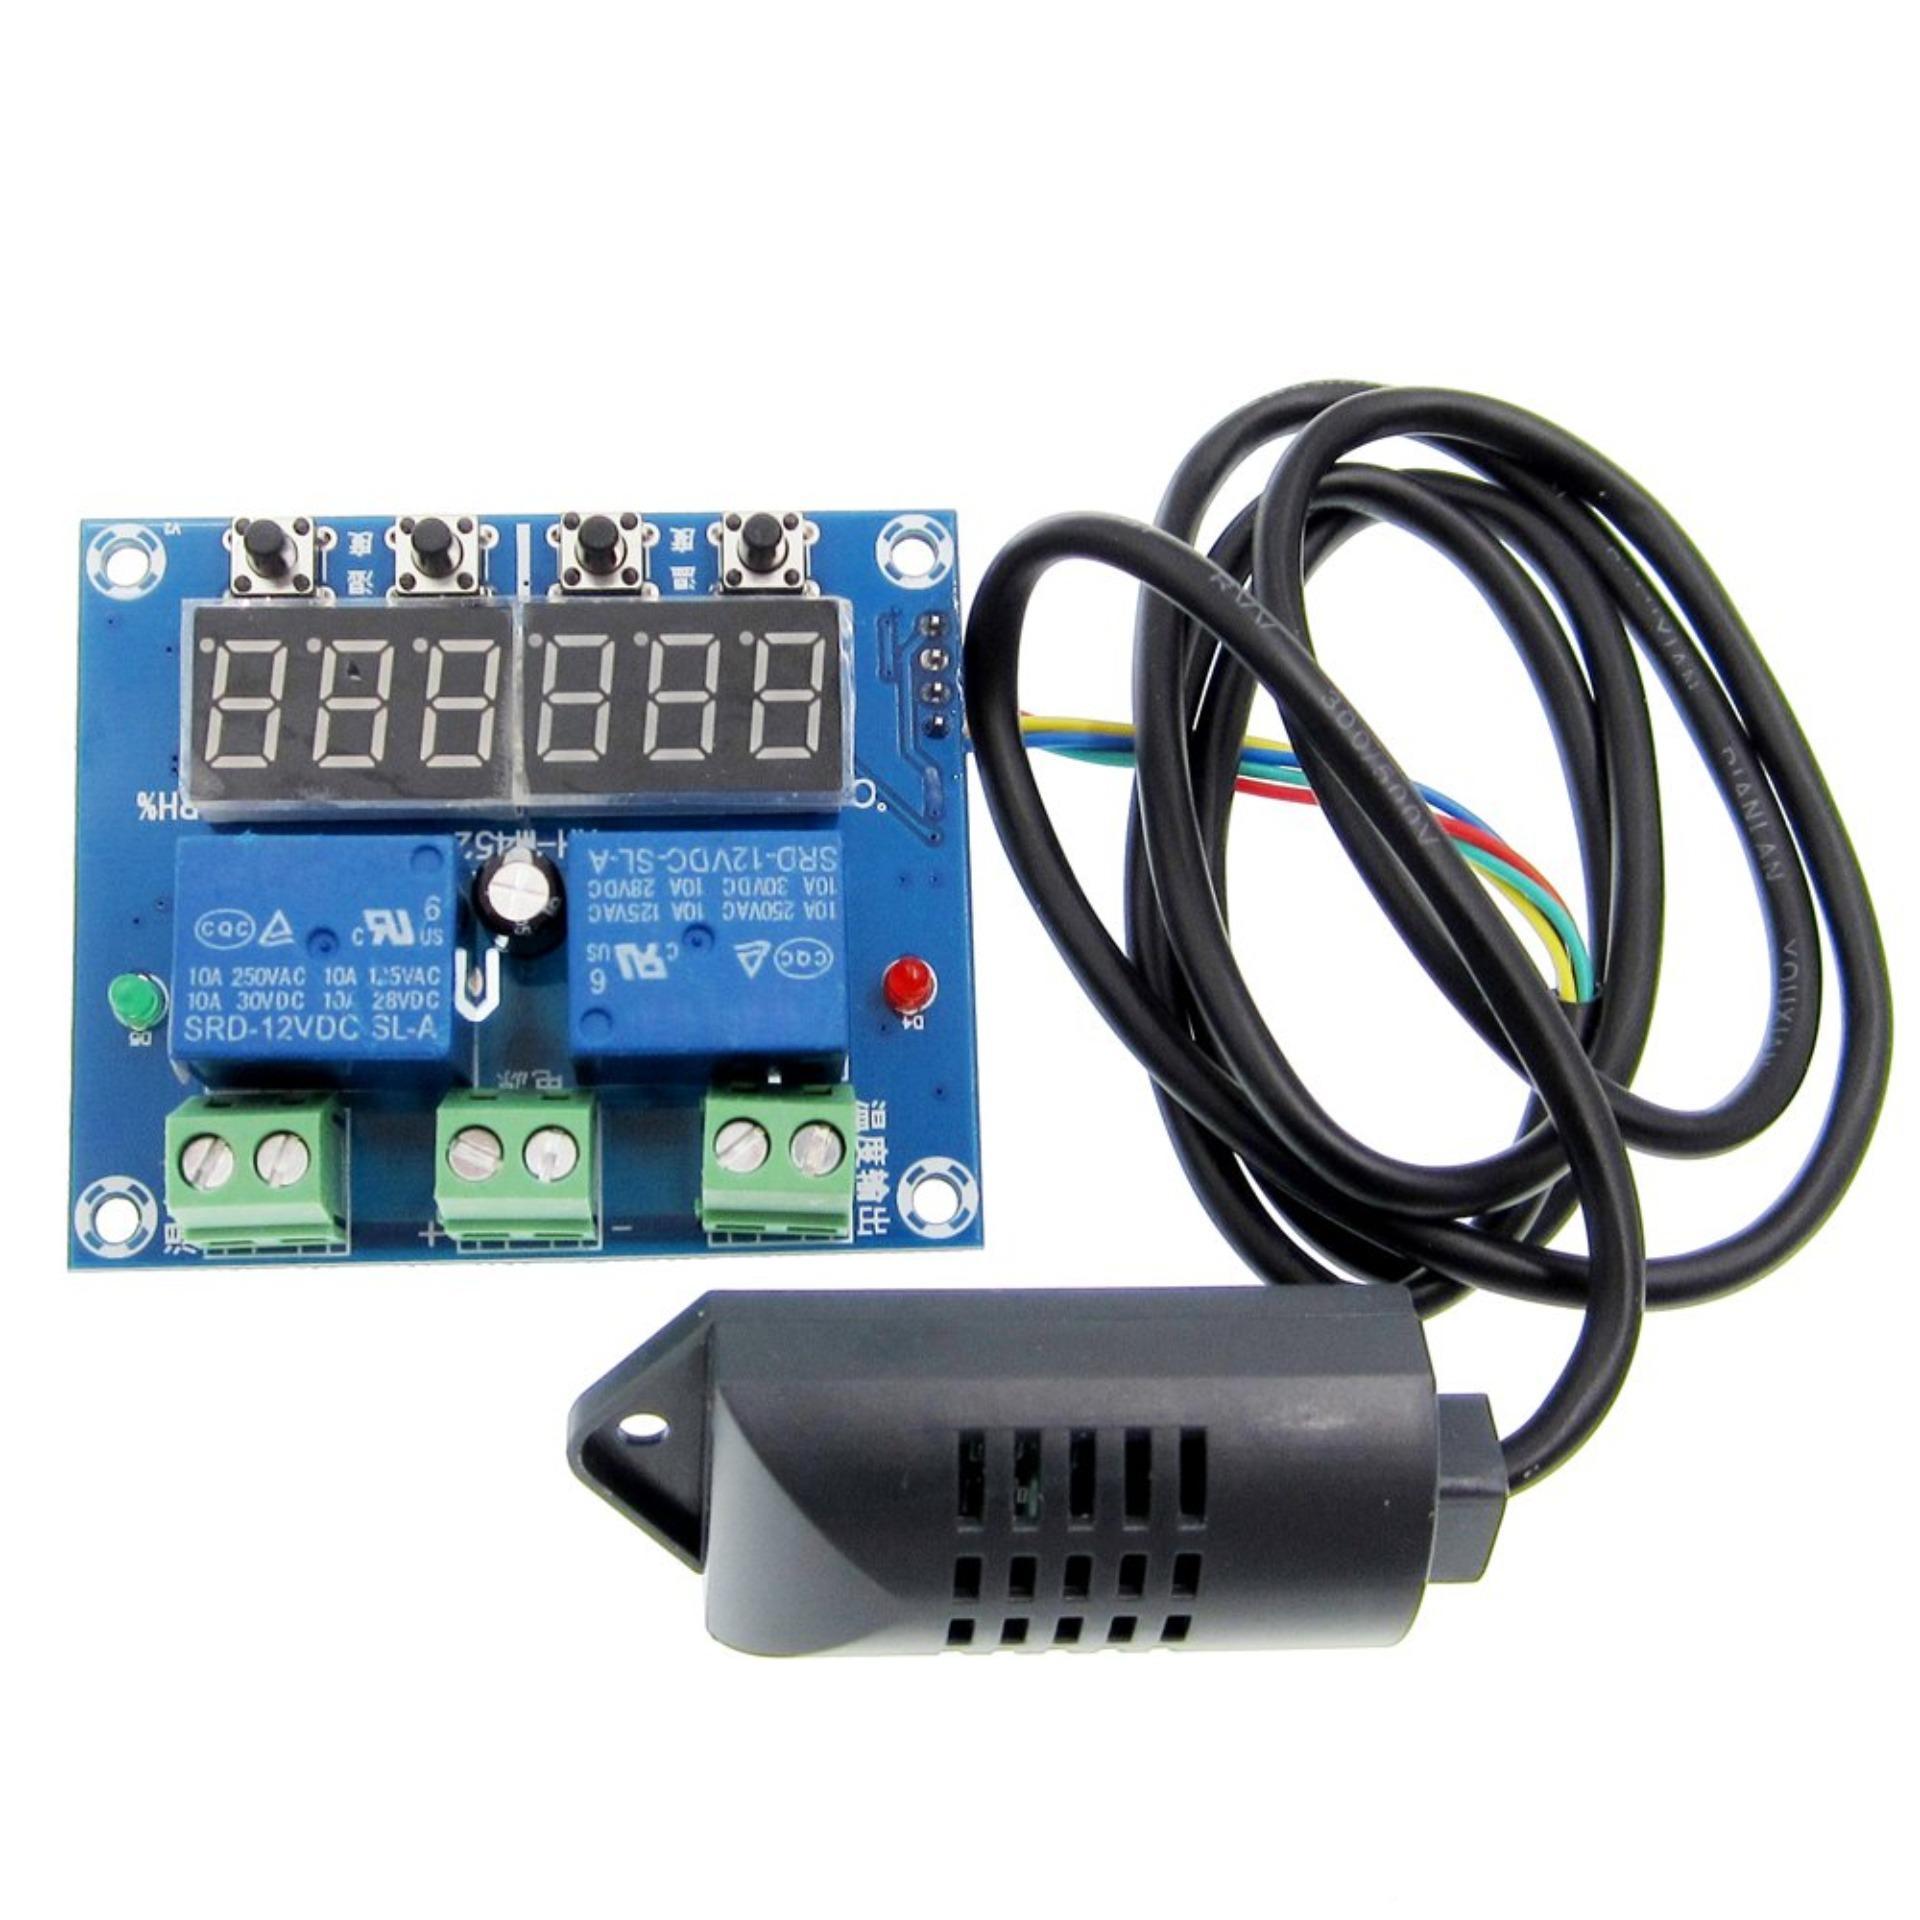 Buy Electronics PRO Automotive Gauges at Best Prices Online